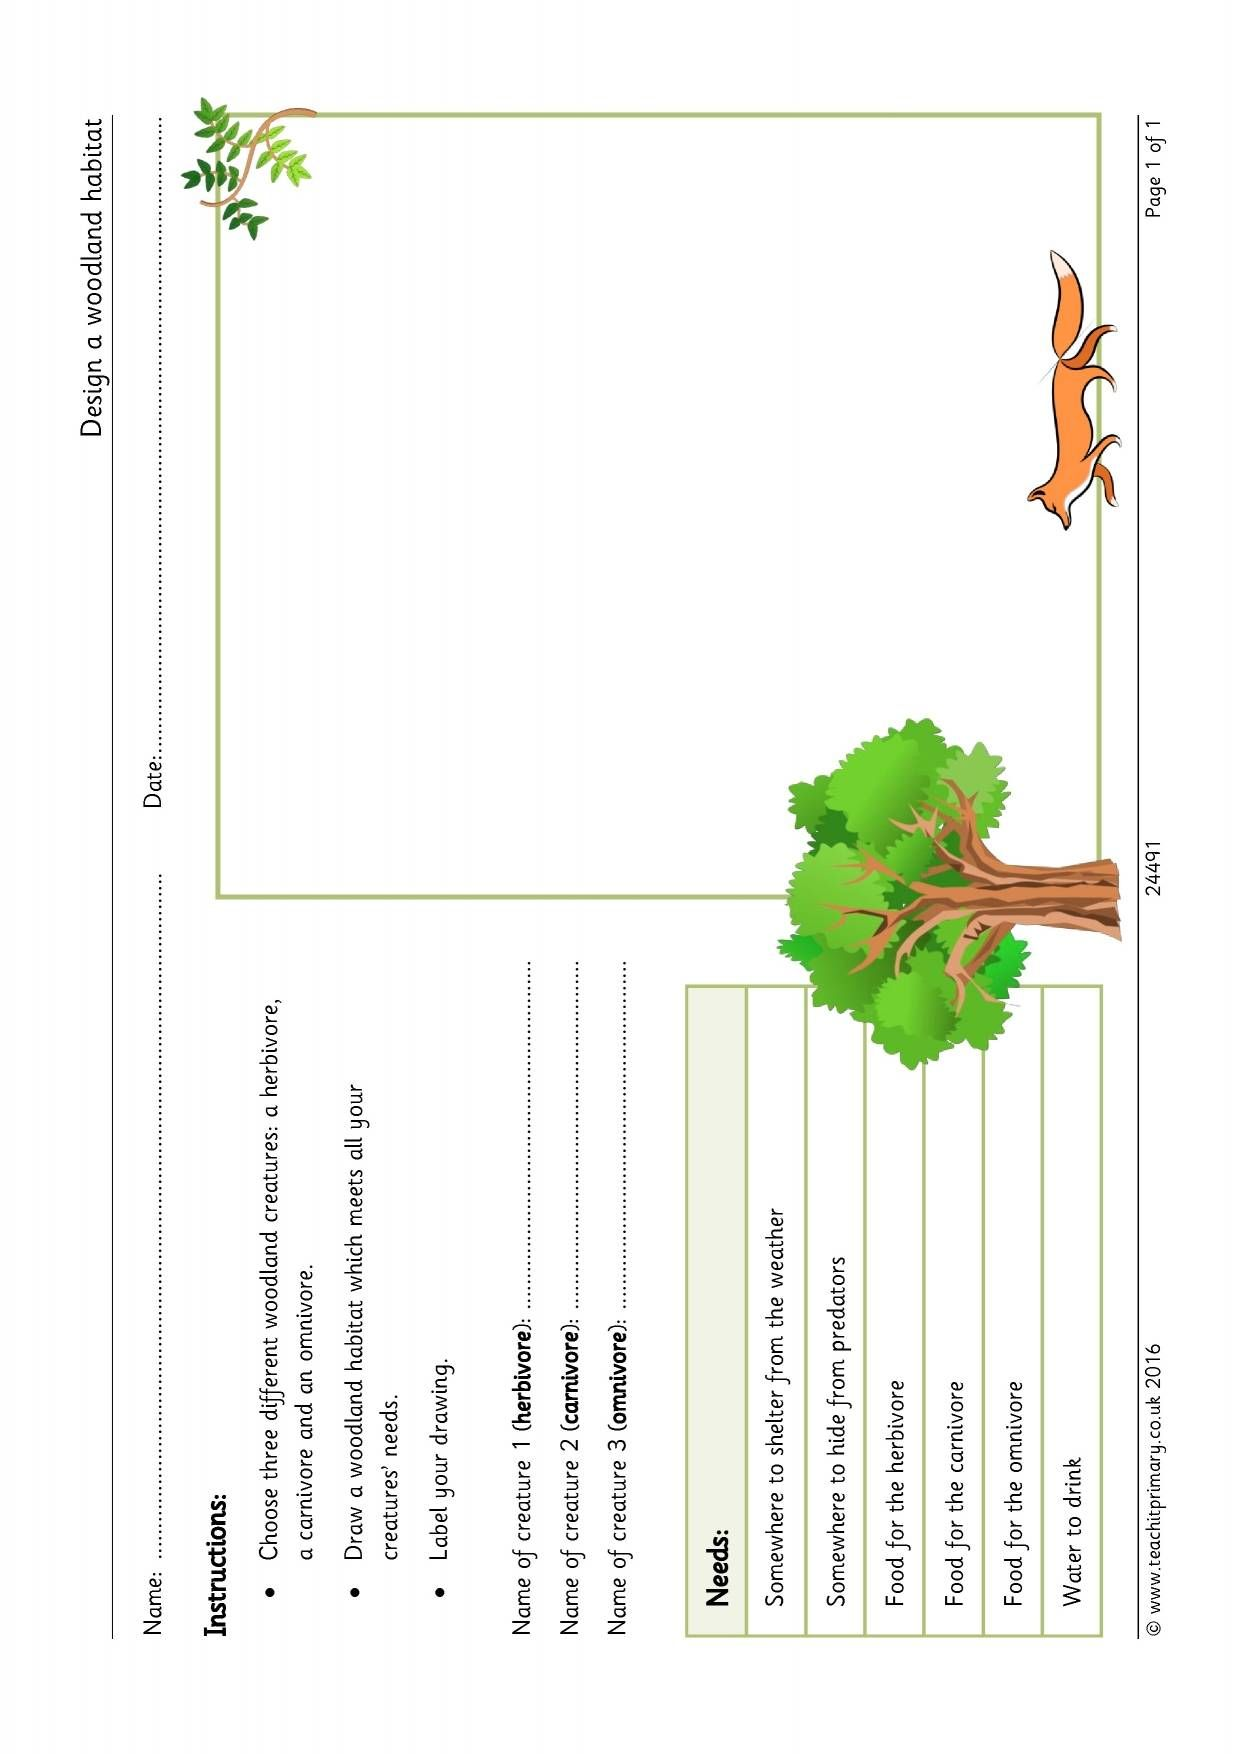 Design A Woodland Habitat